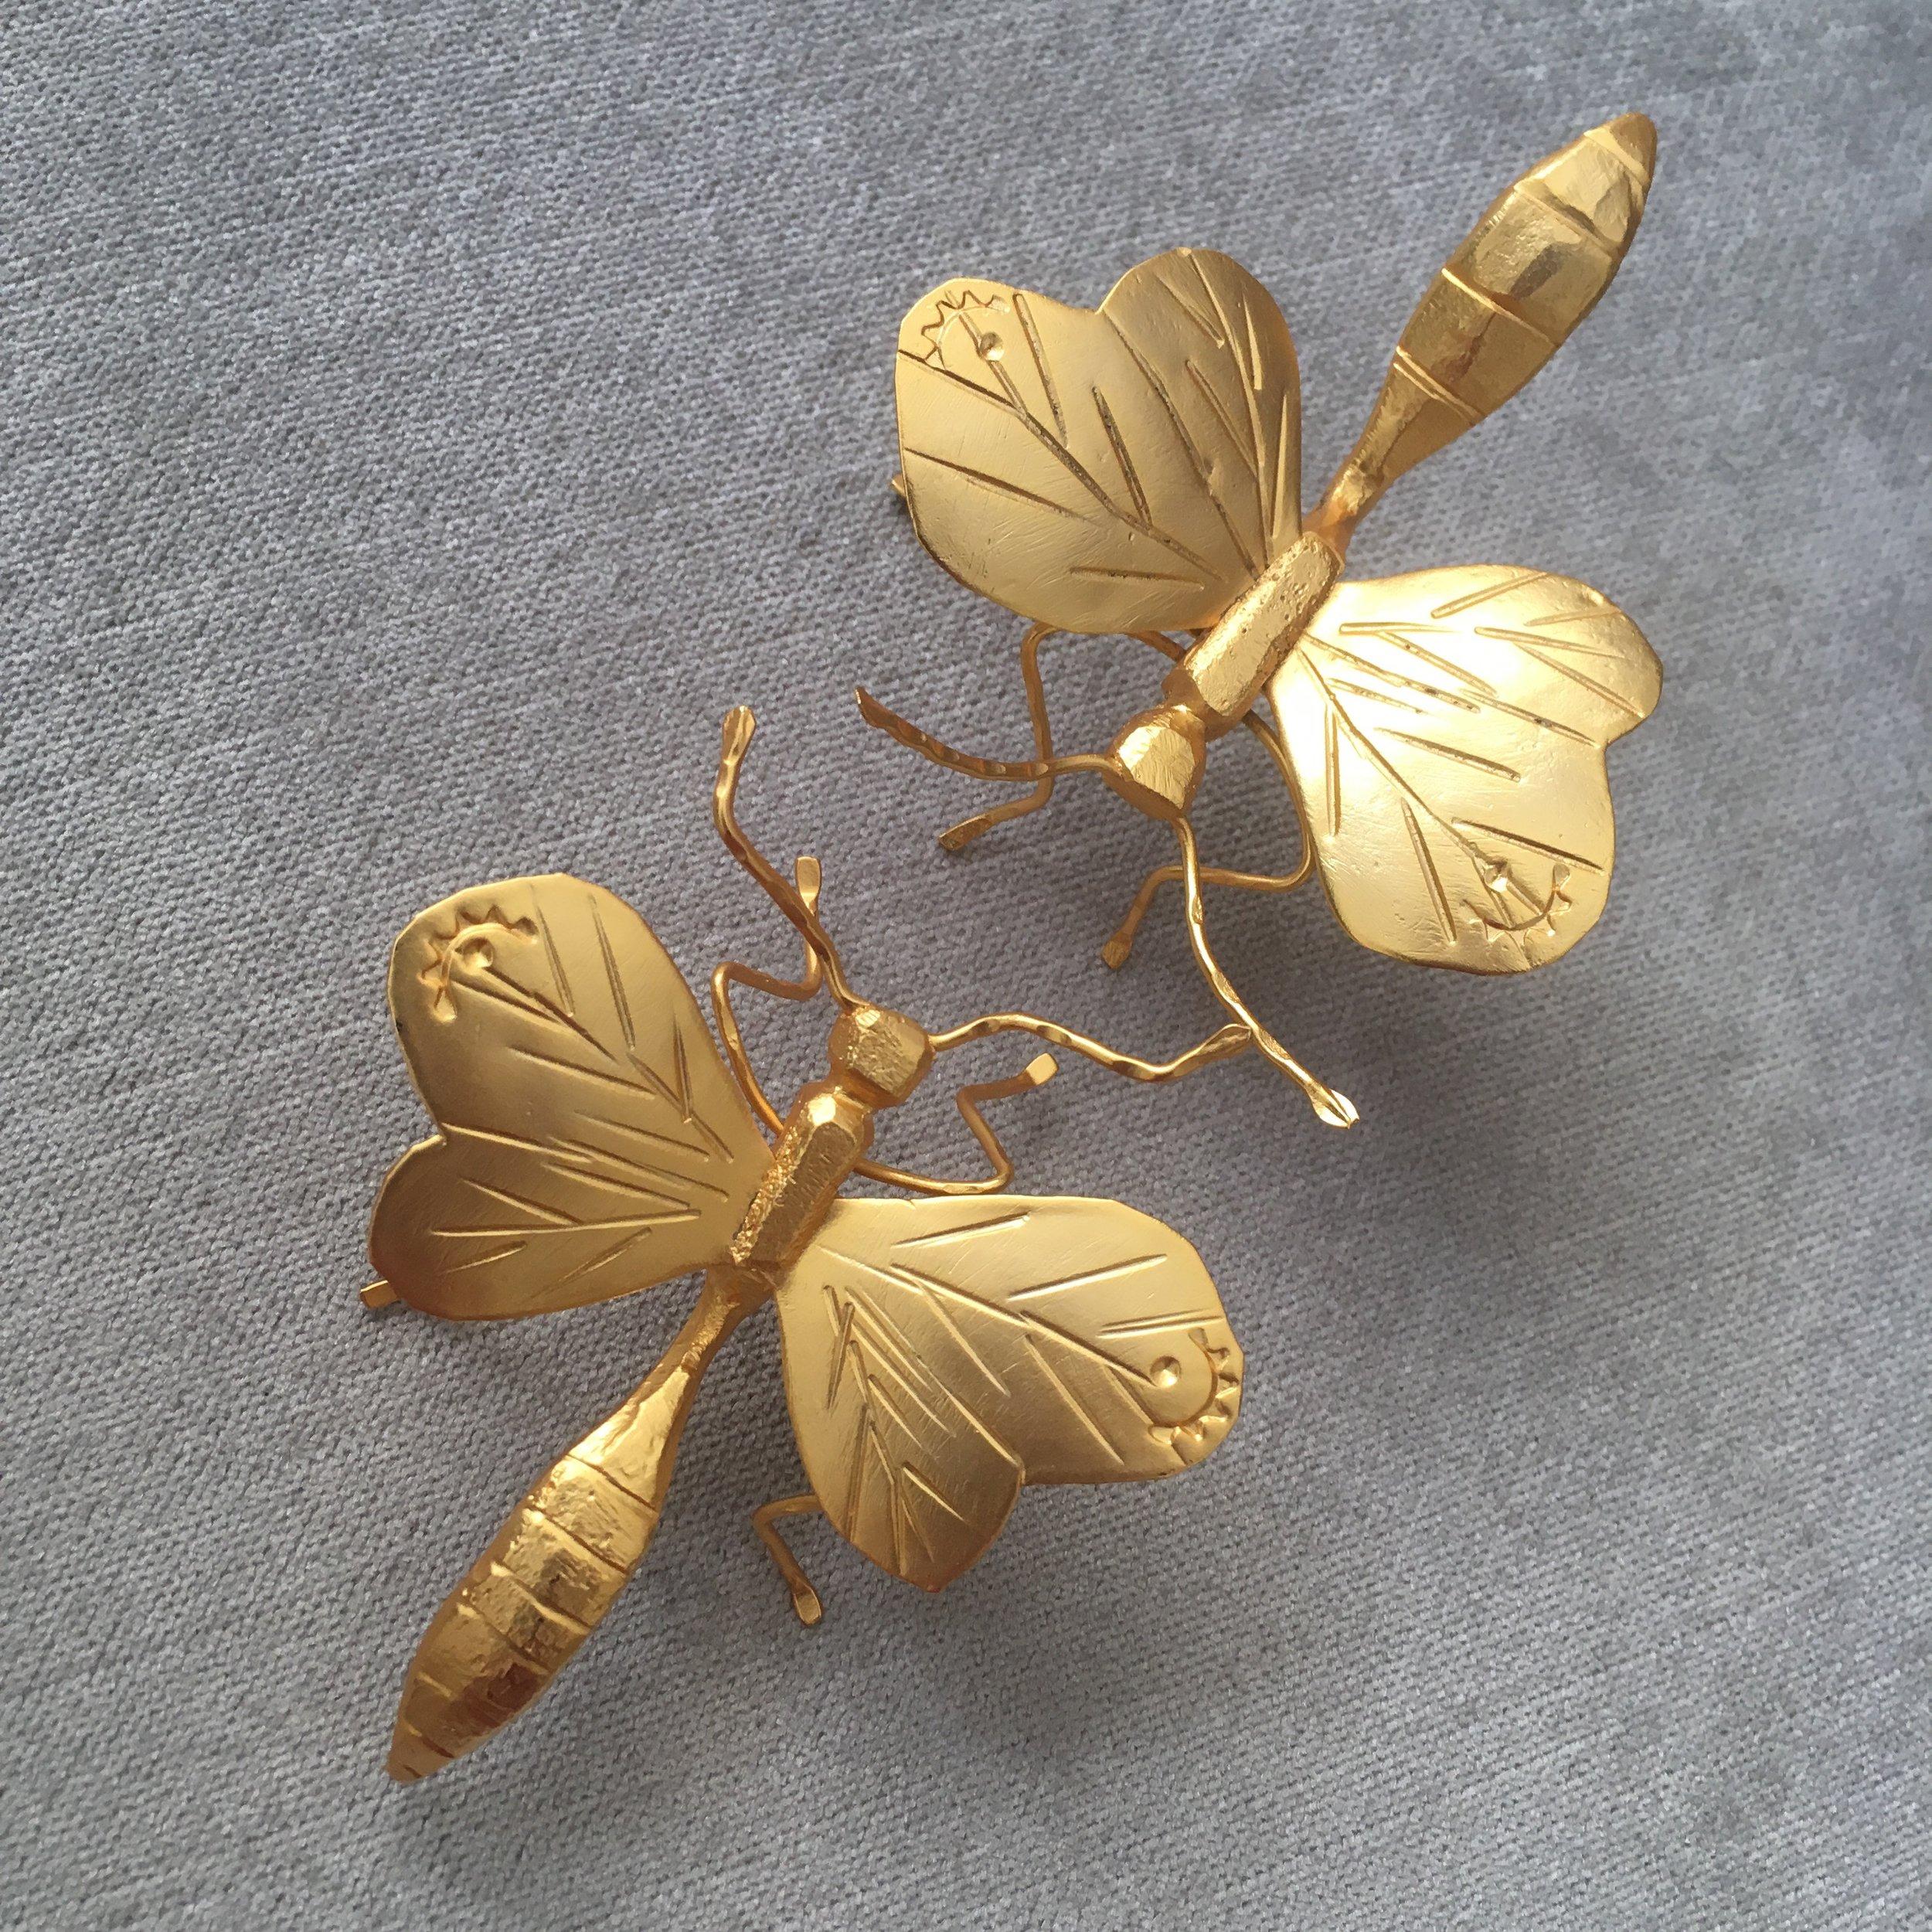 wisteria chrysalis -